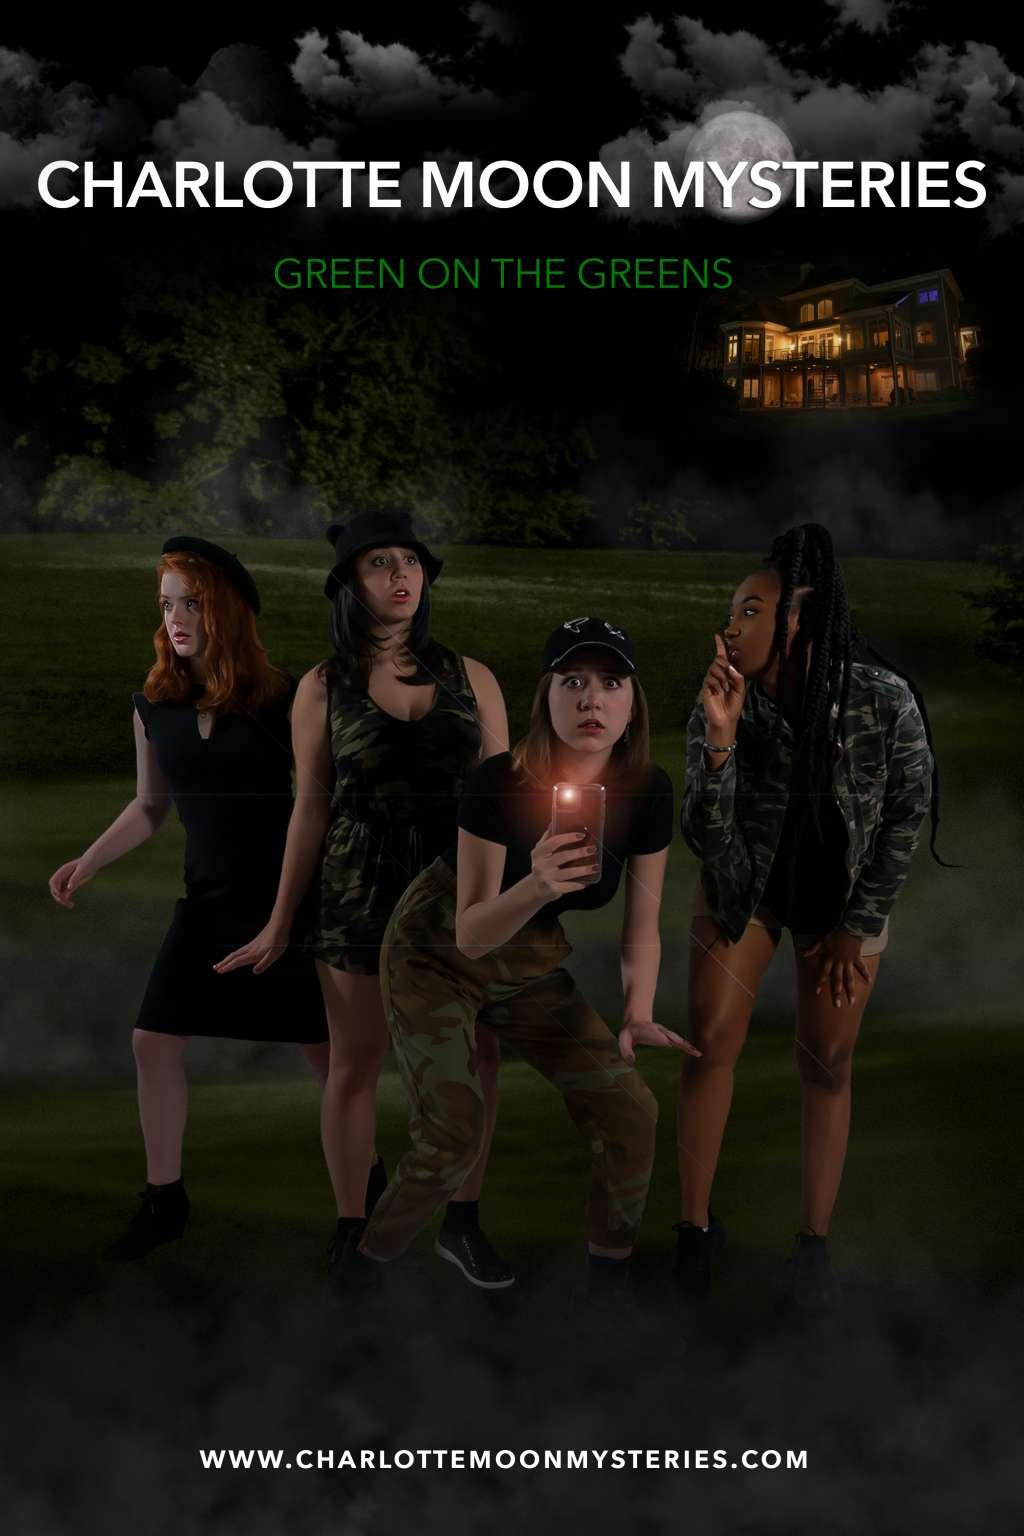 Charlotte Moon Mysteries: Green on the Greens kapak